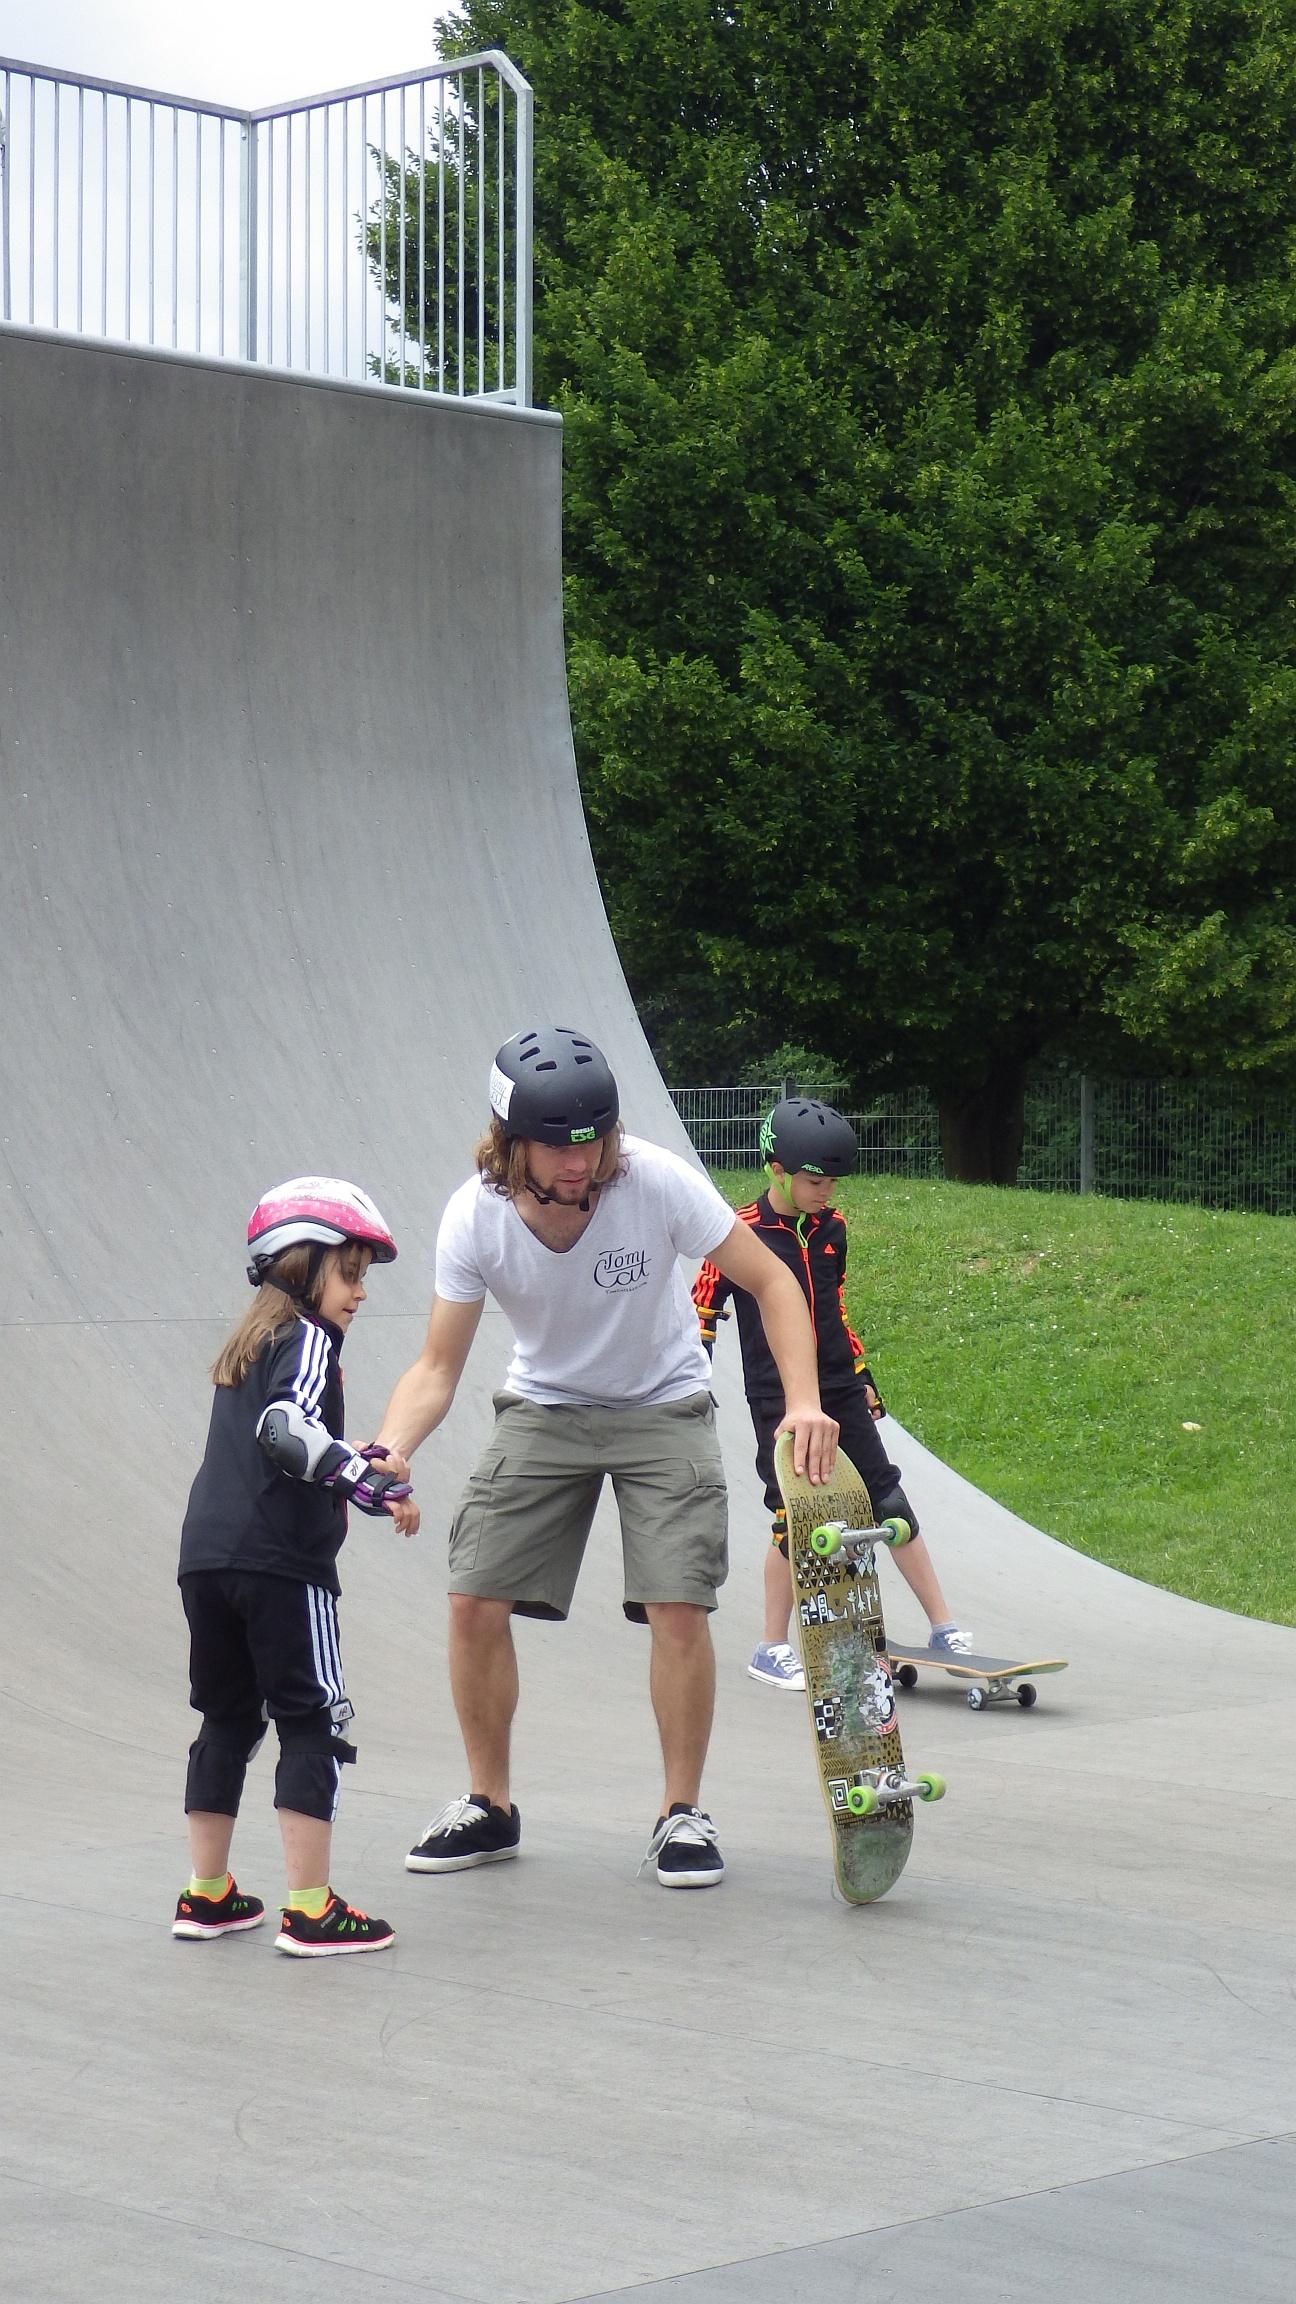 Skatekurs Pullach Skatepark München Skateworkshop TomCatSkate.com SKA.JPG